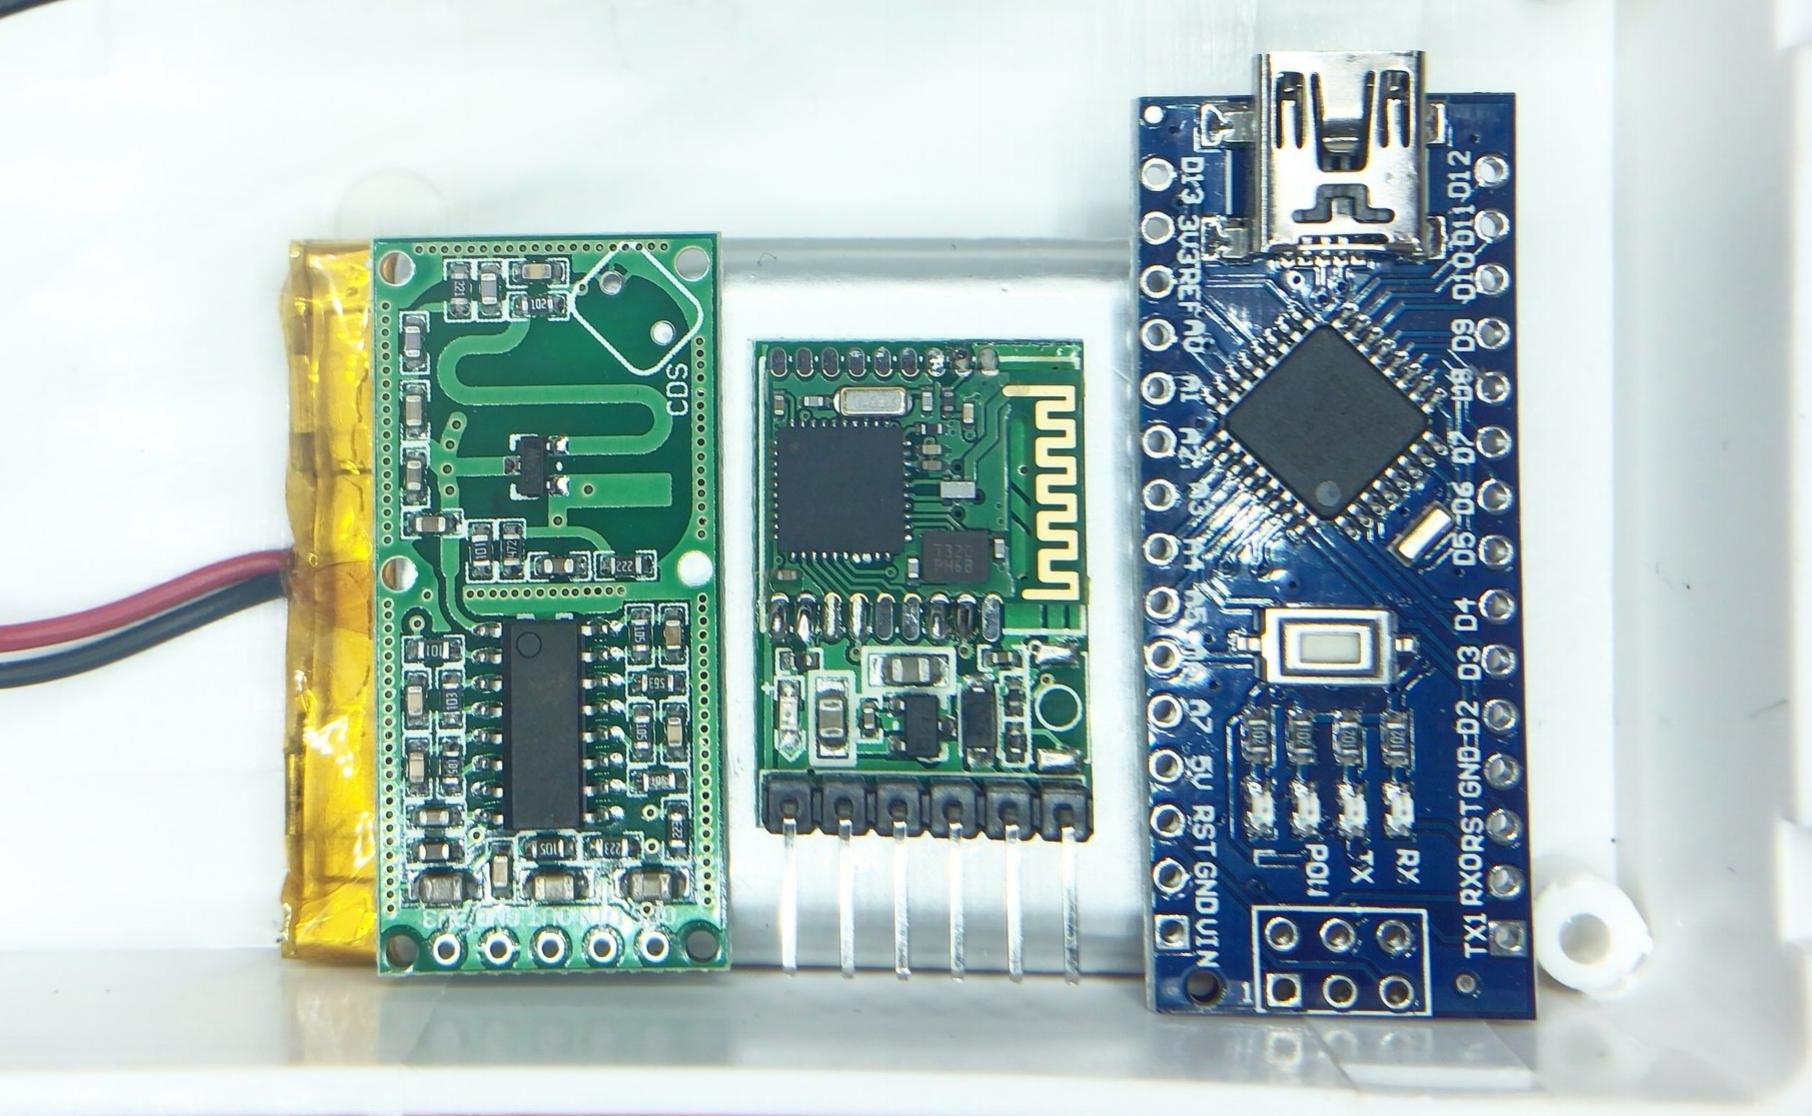 Arduino wall penetrating motion sensor using the rcwl 0516 microwave